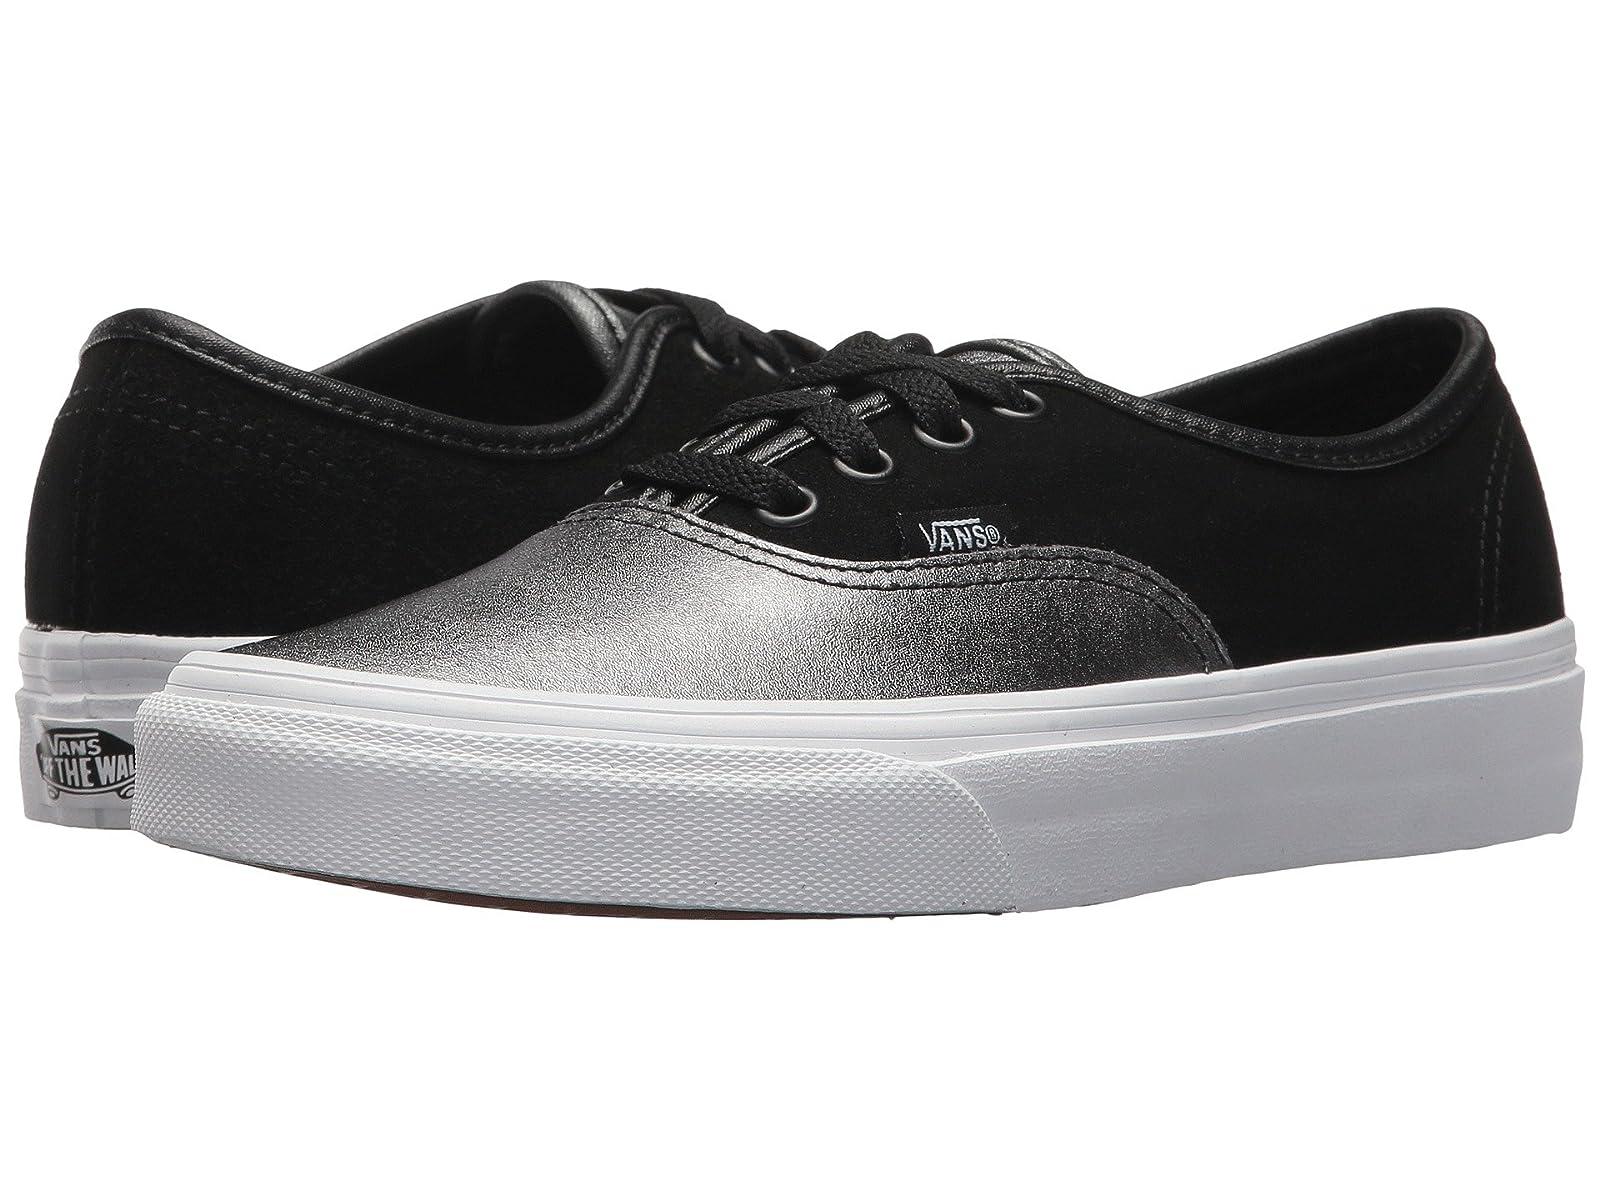 Vans Authentic™Atmospheric grades have affordable shoes